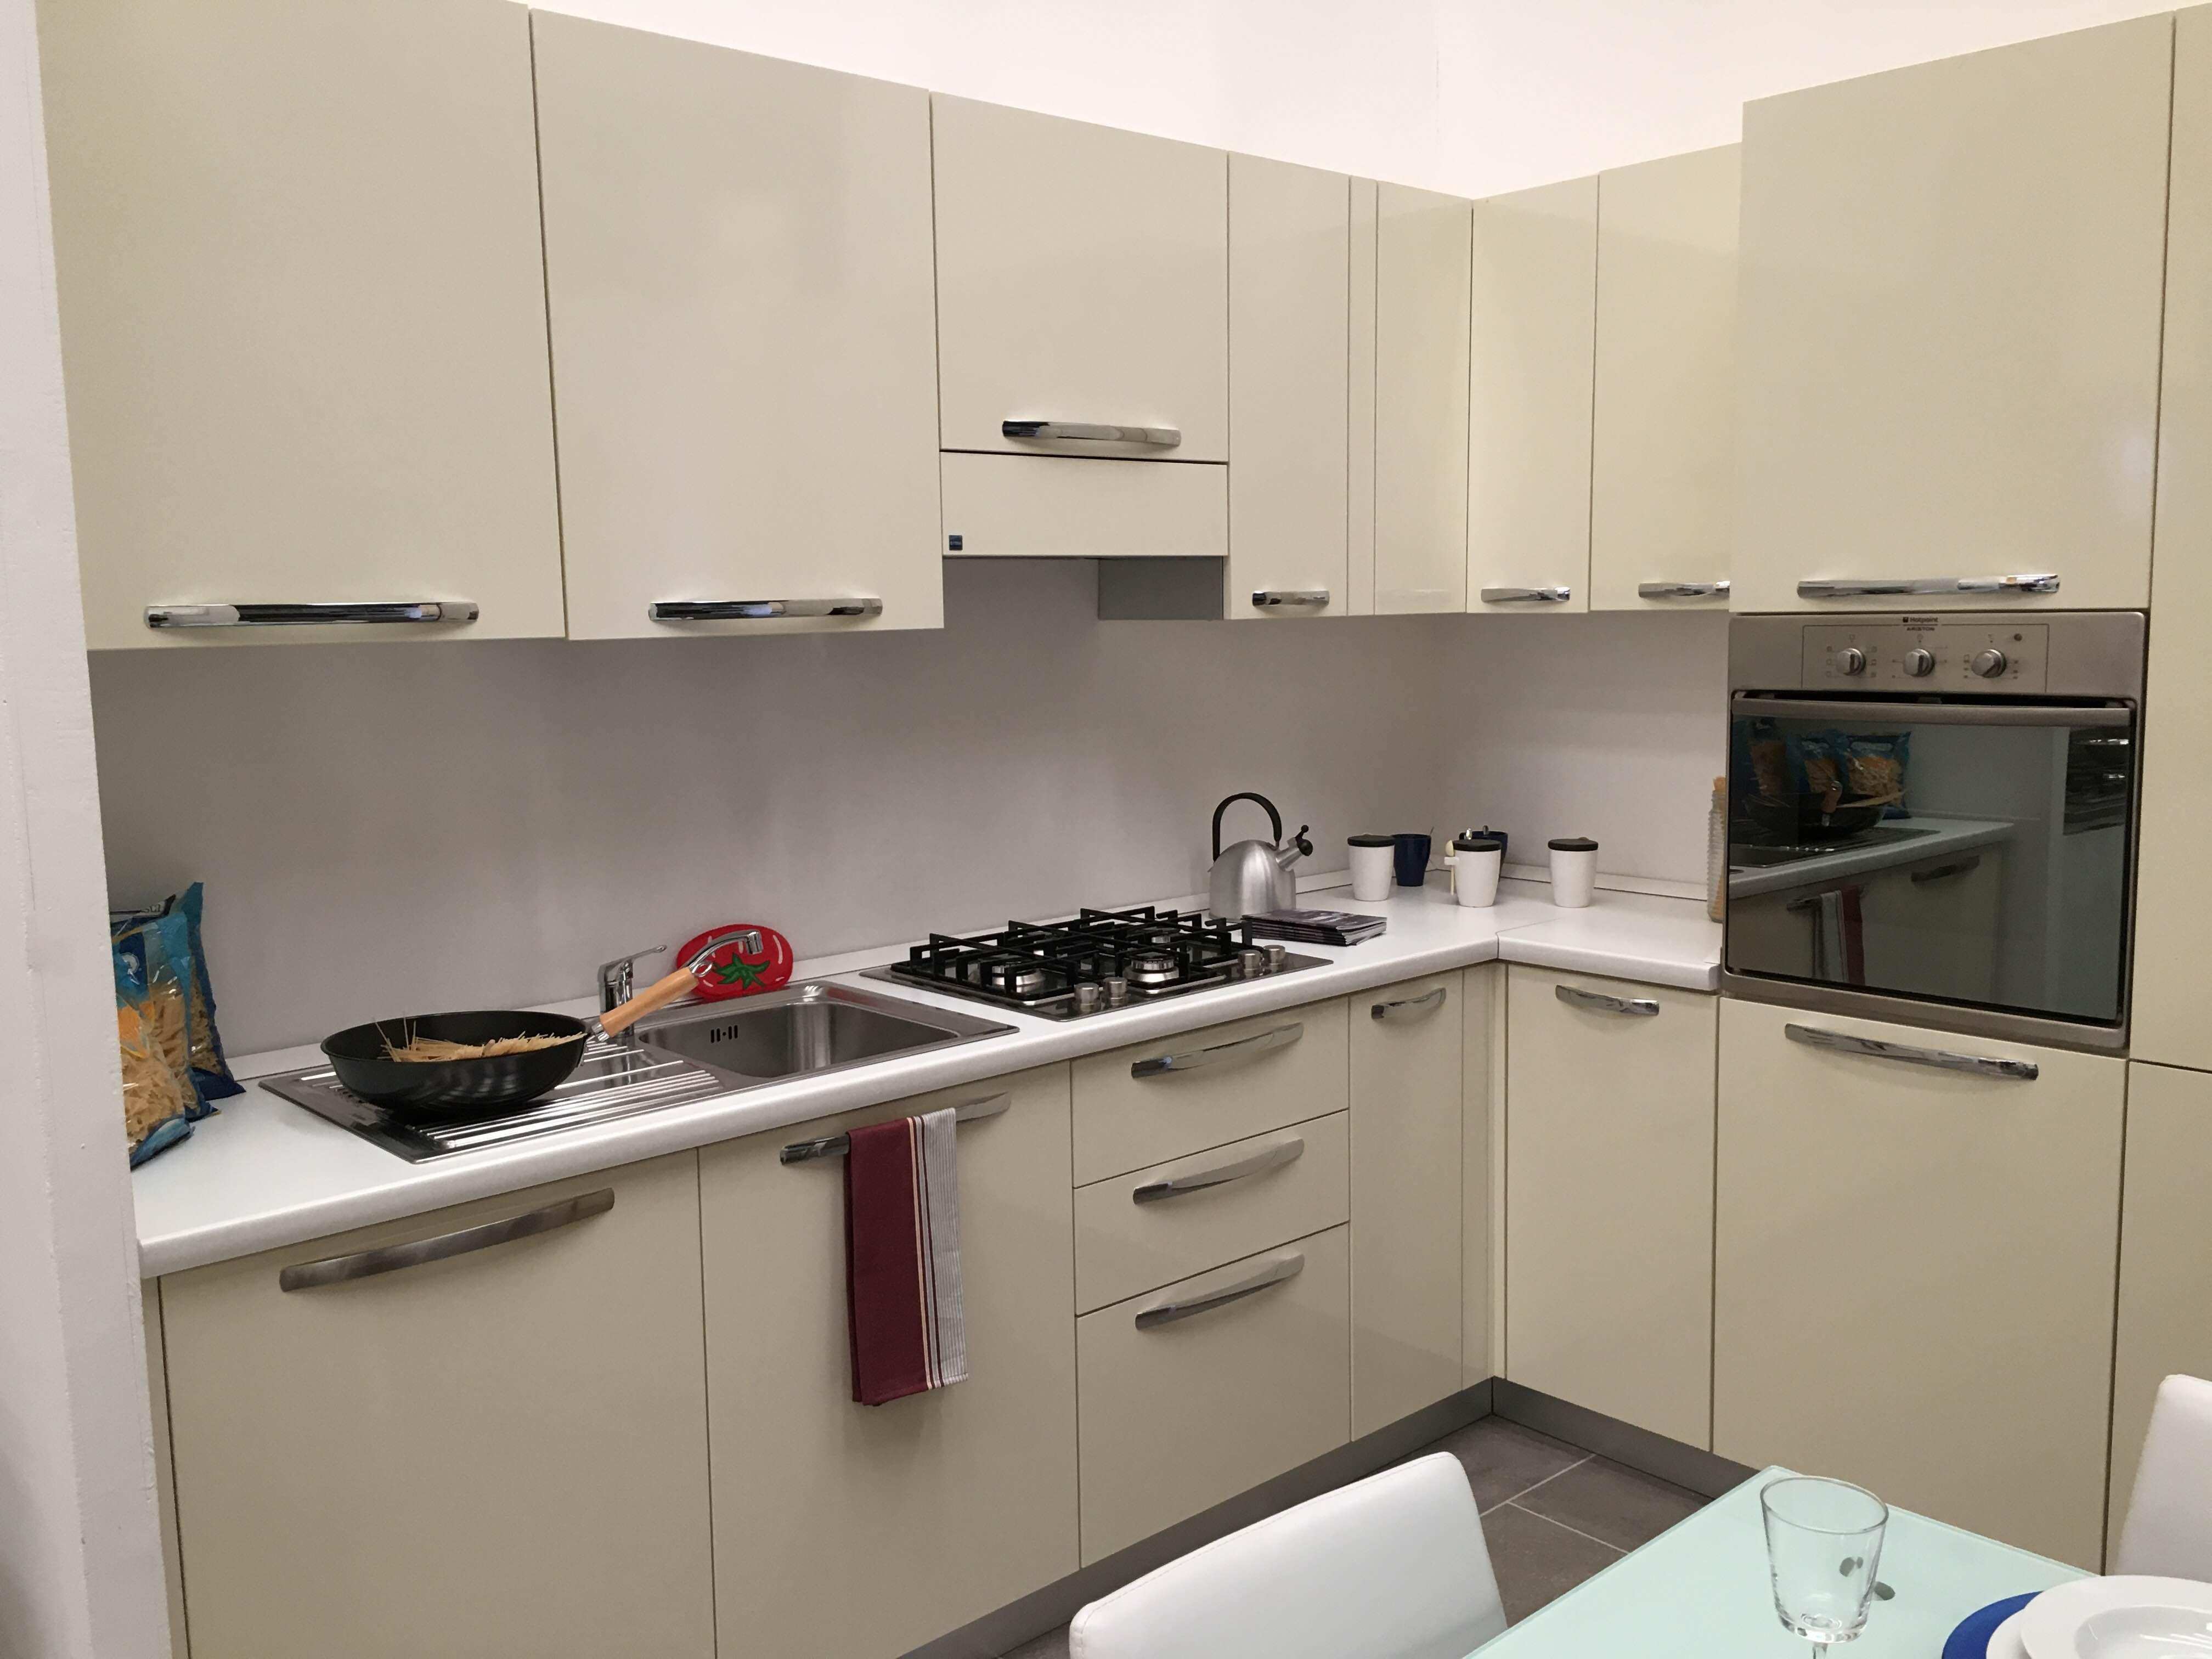 Cucina Stosa angolare. Outlet - 40% - Lorenzelli Arredamenti